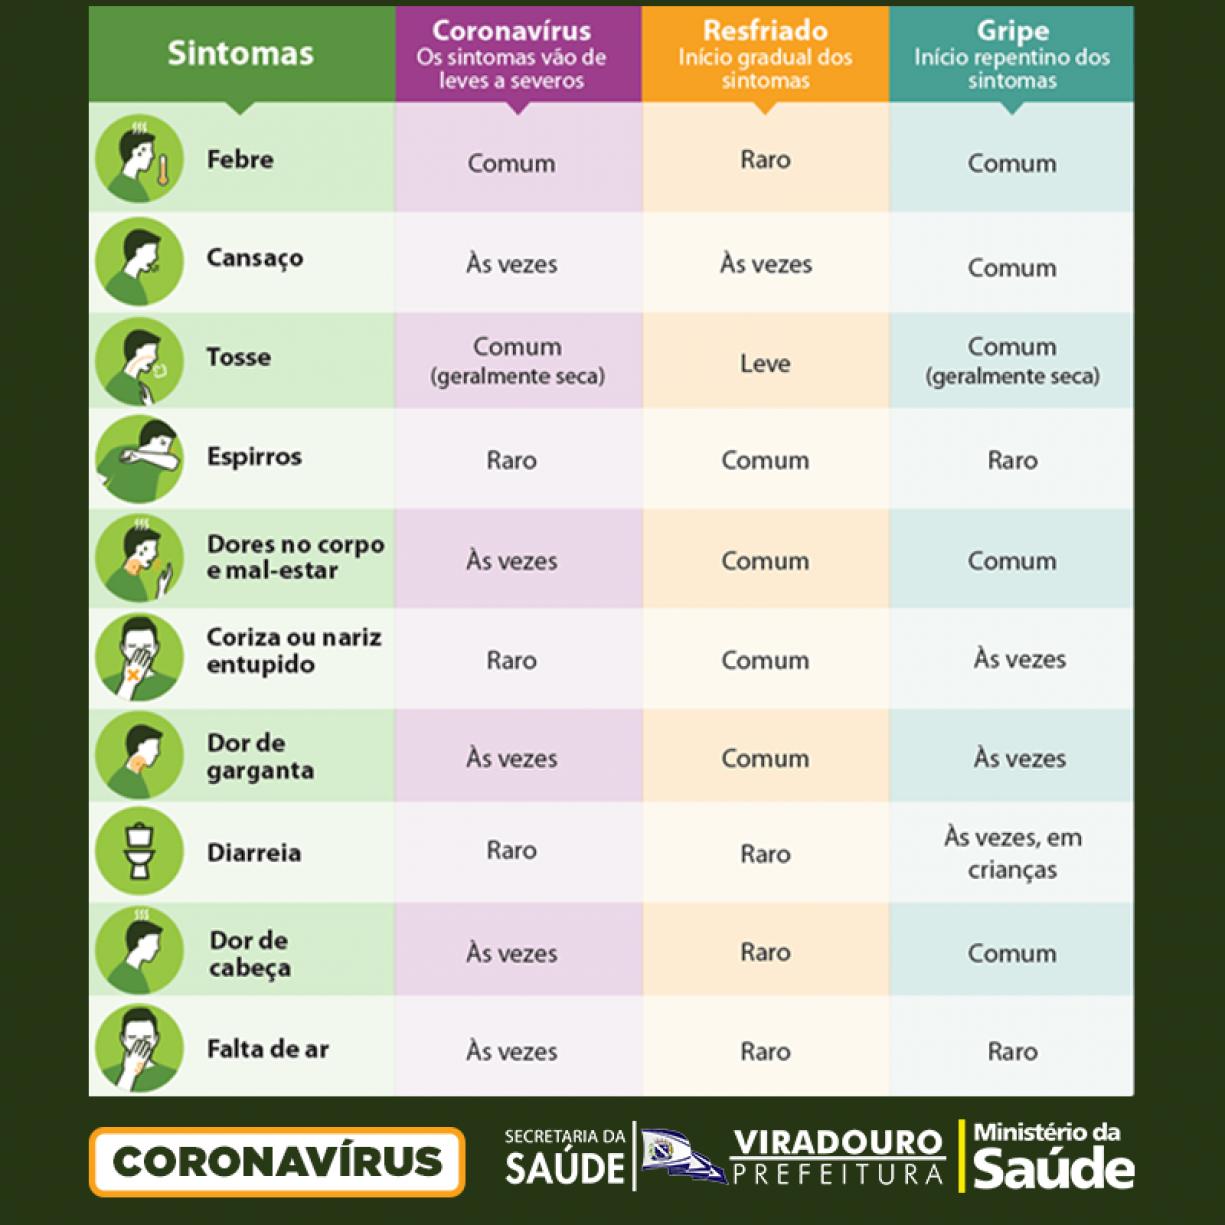 Saiba Como Diferenciar os Sintomas da Gripe, Resfriado e do Coronavírus